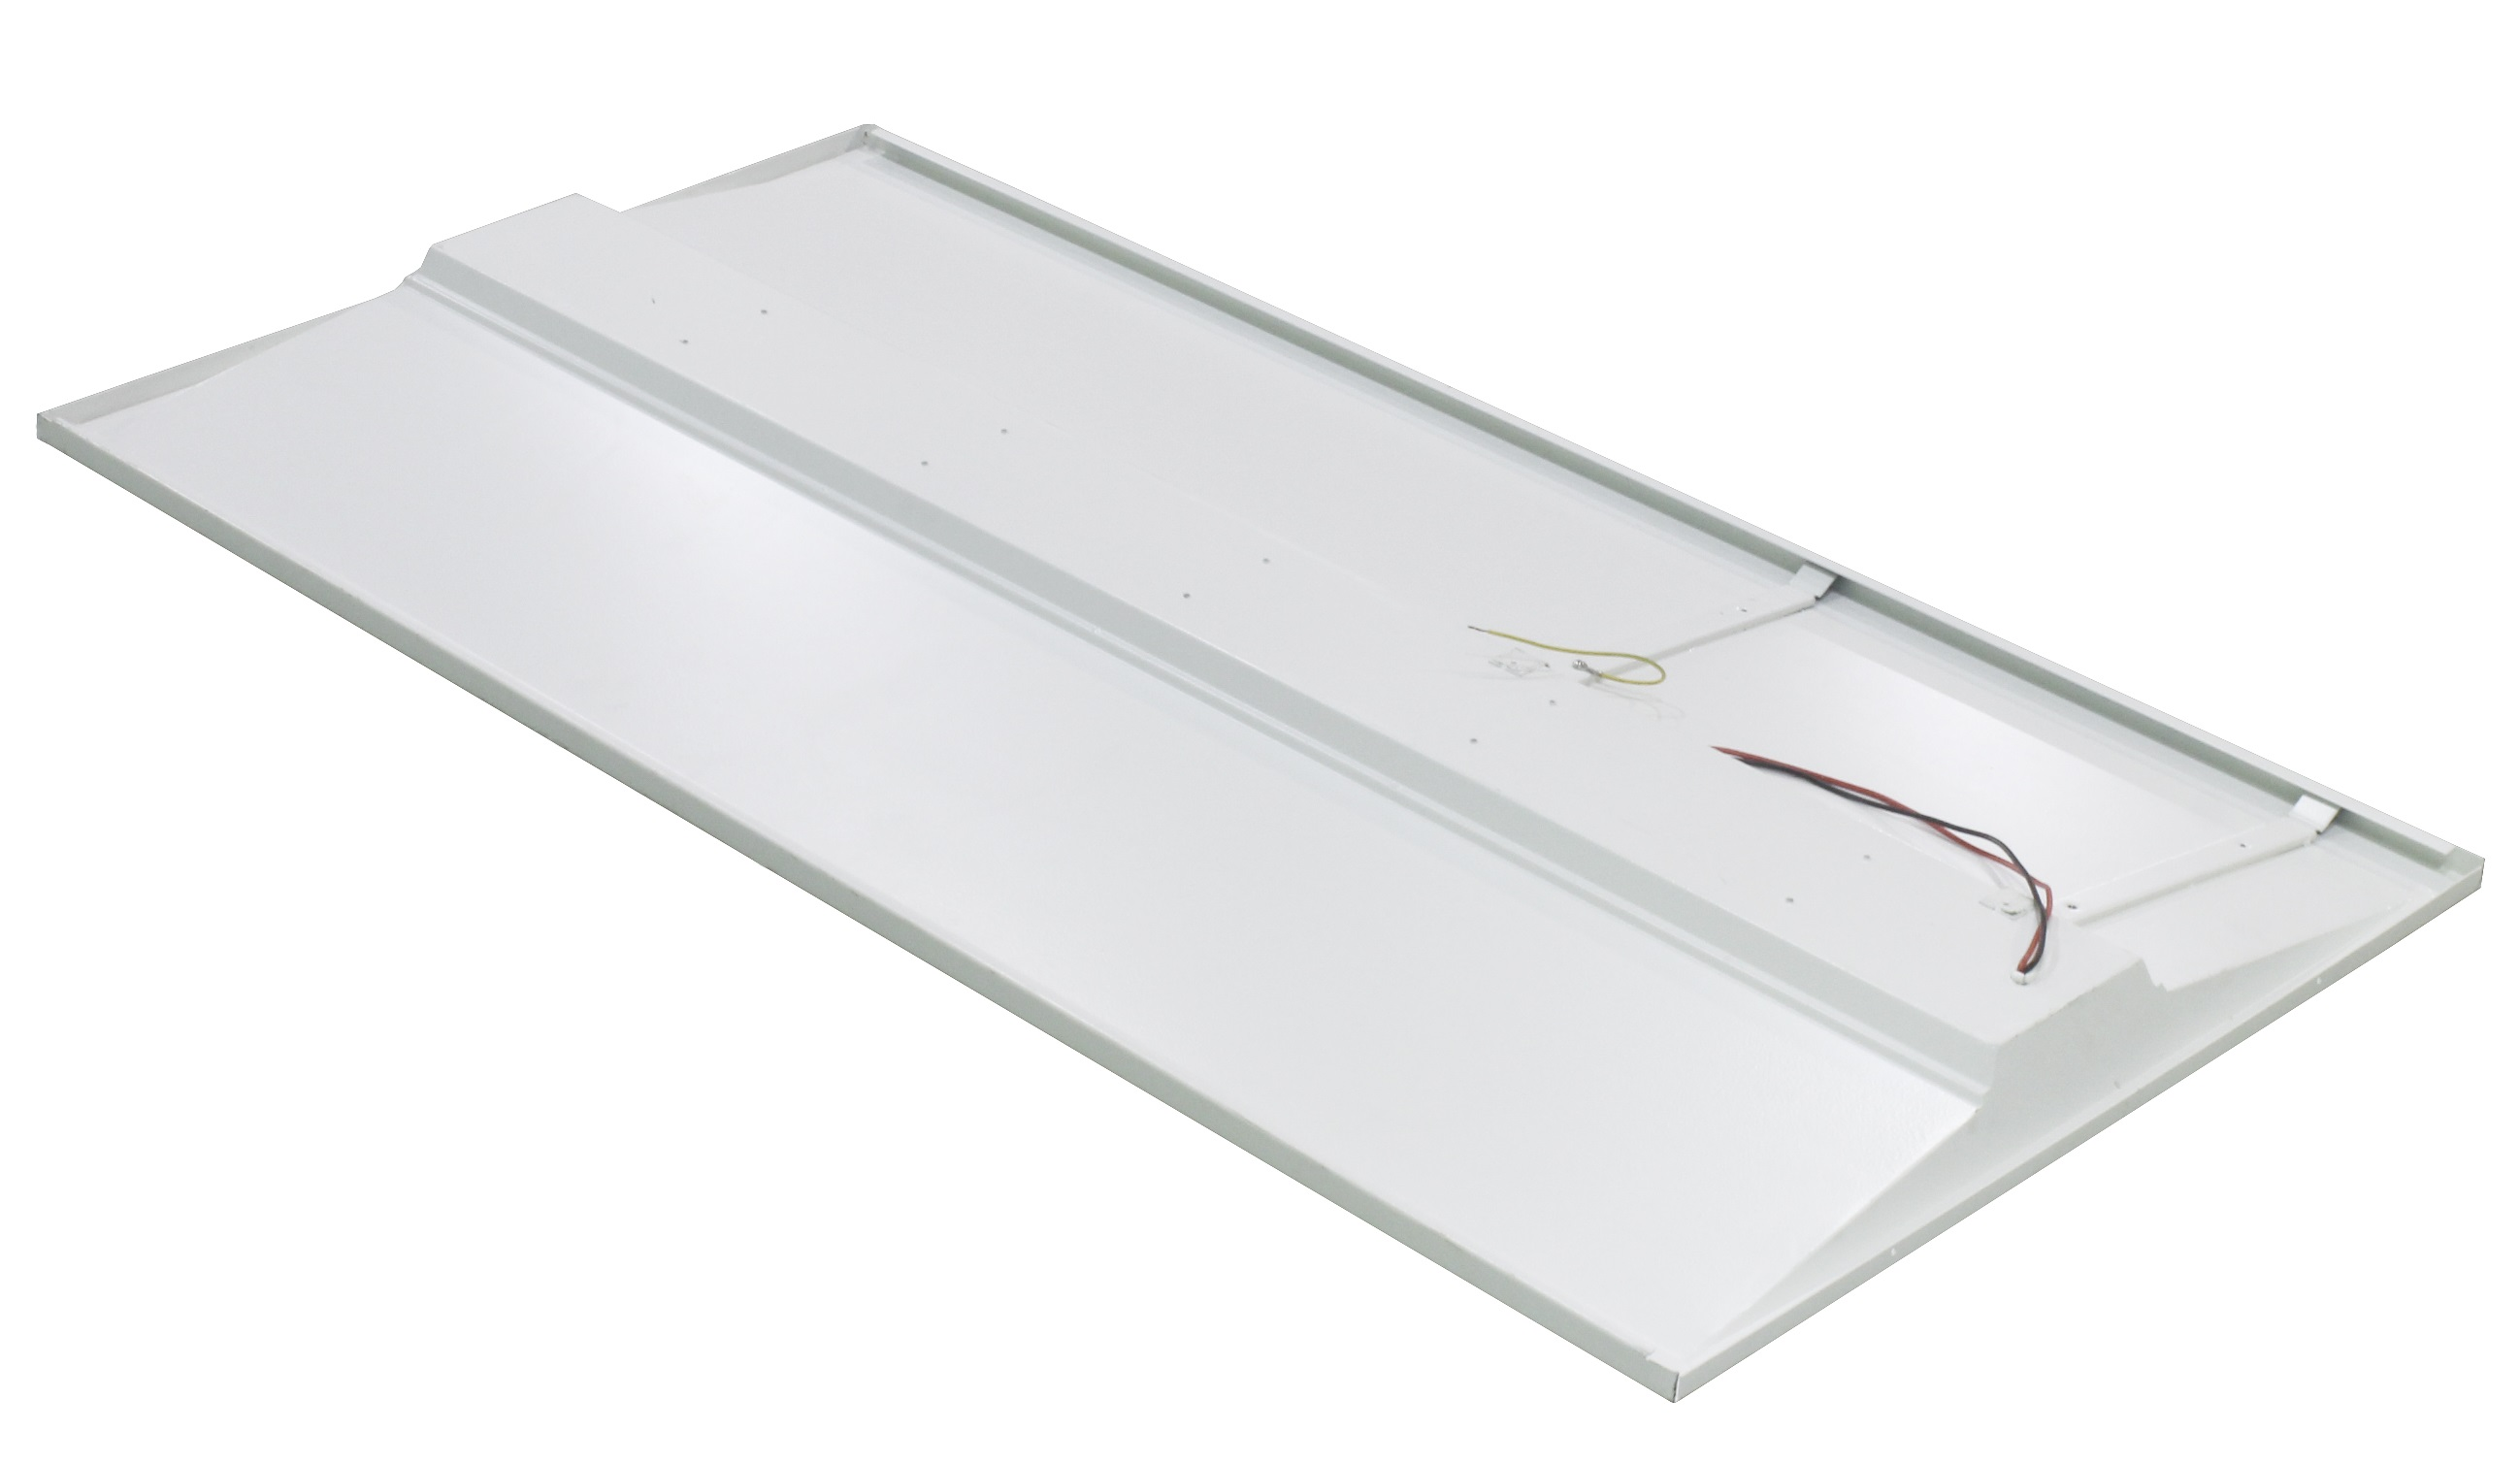 Led Drop Ceiling Lights 2x4 Designs